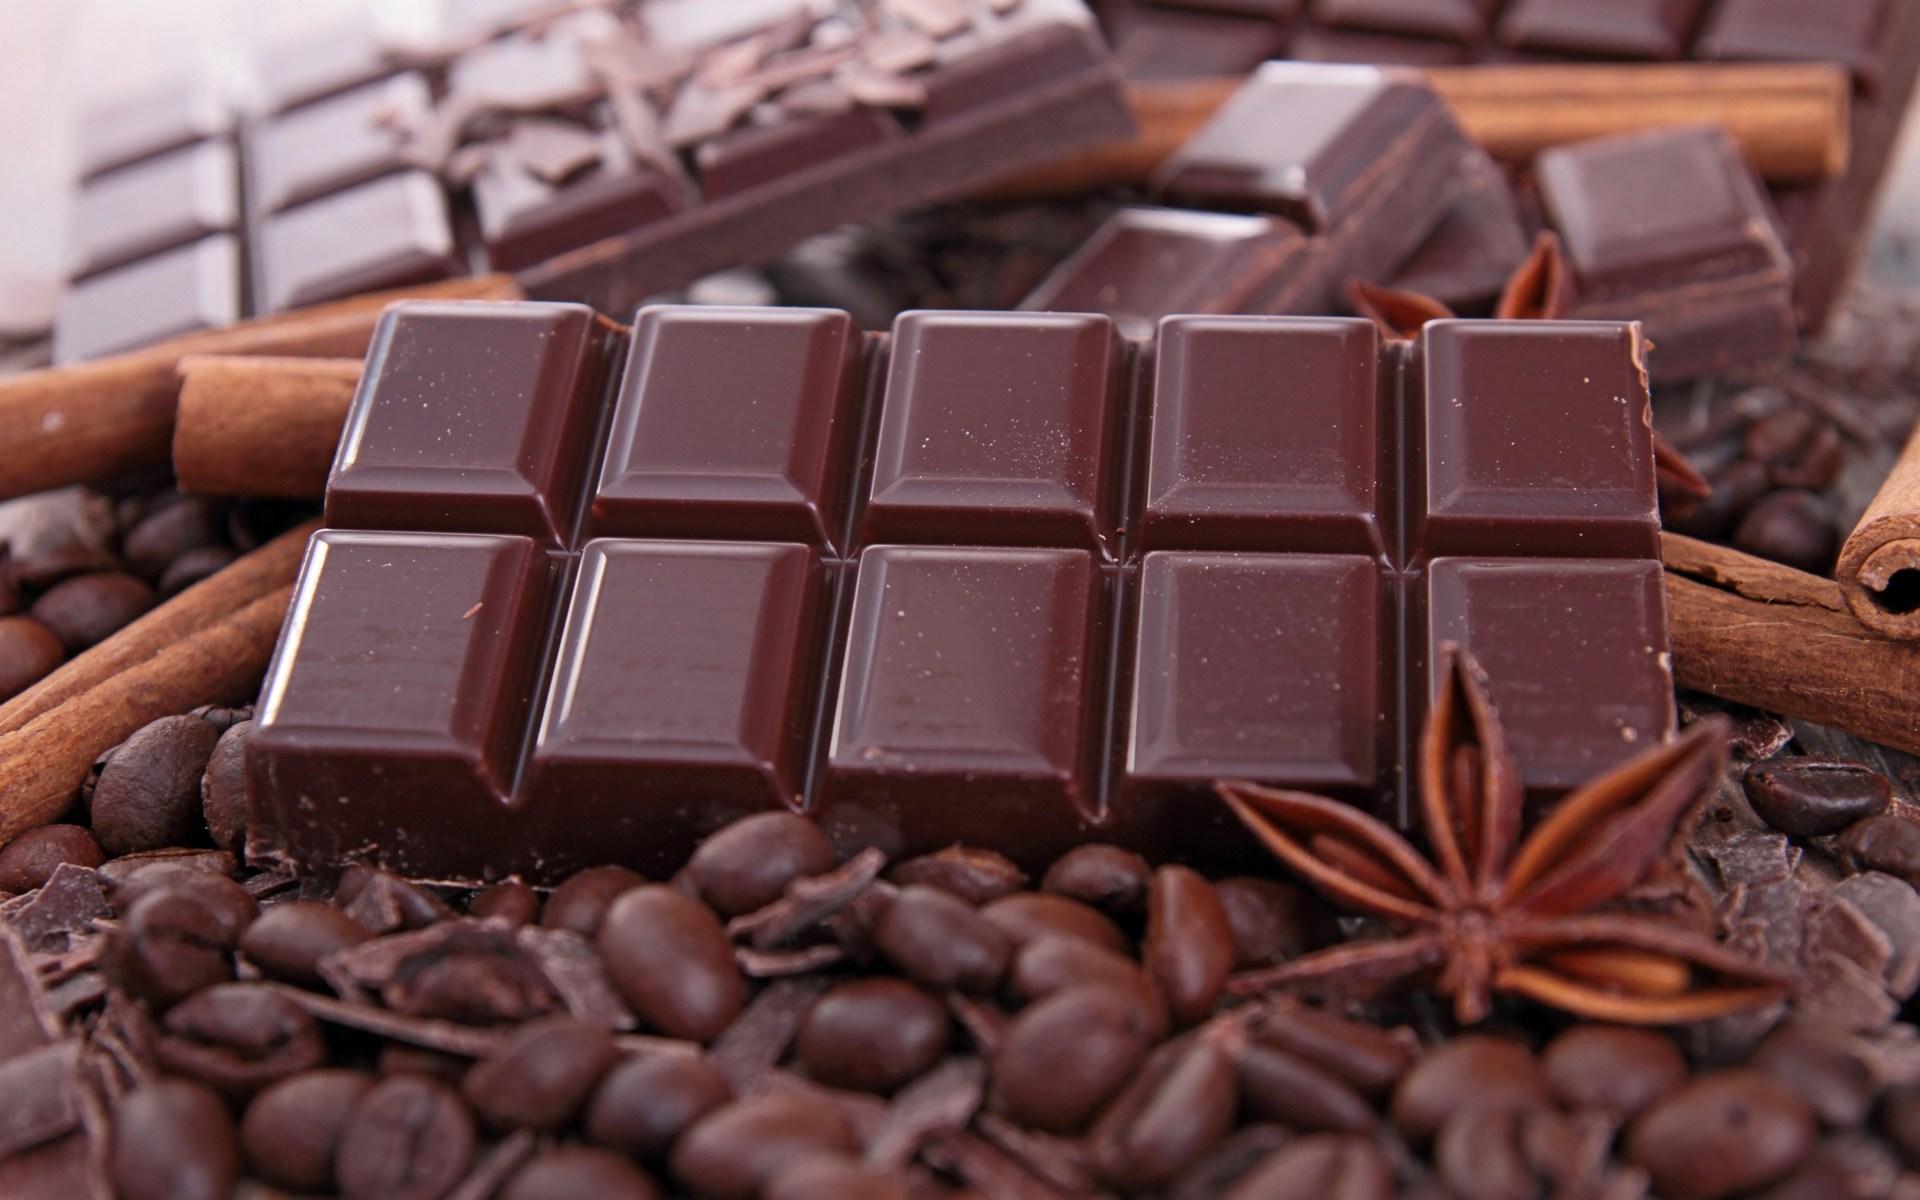 hinh nen chocolate 34